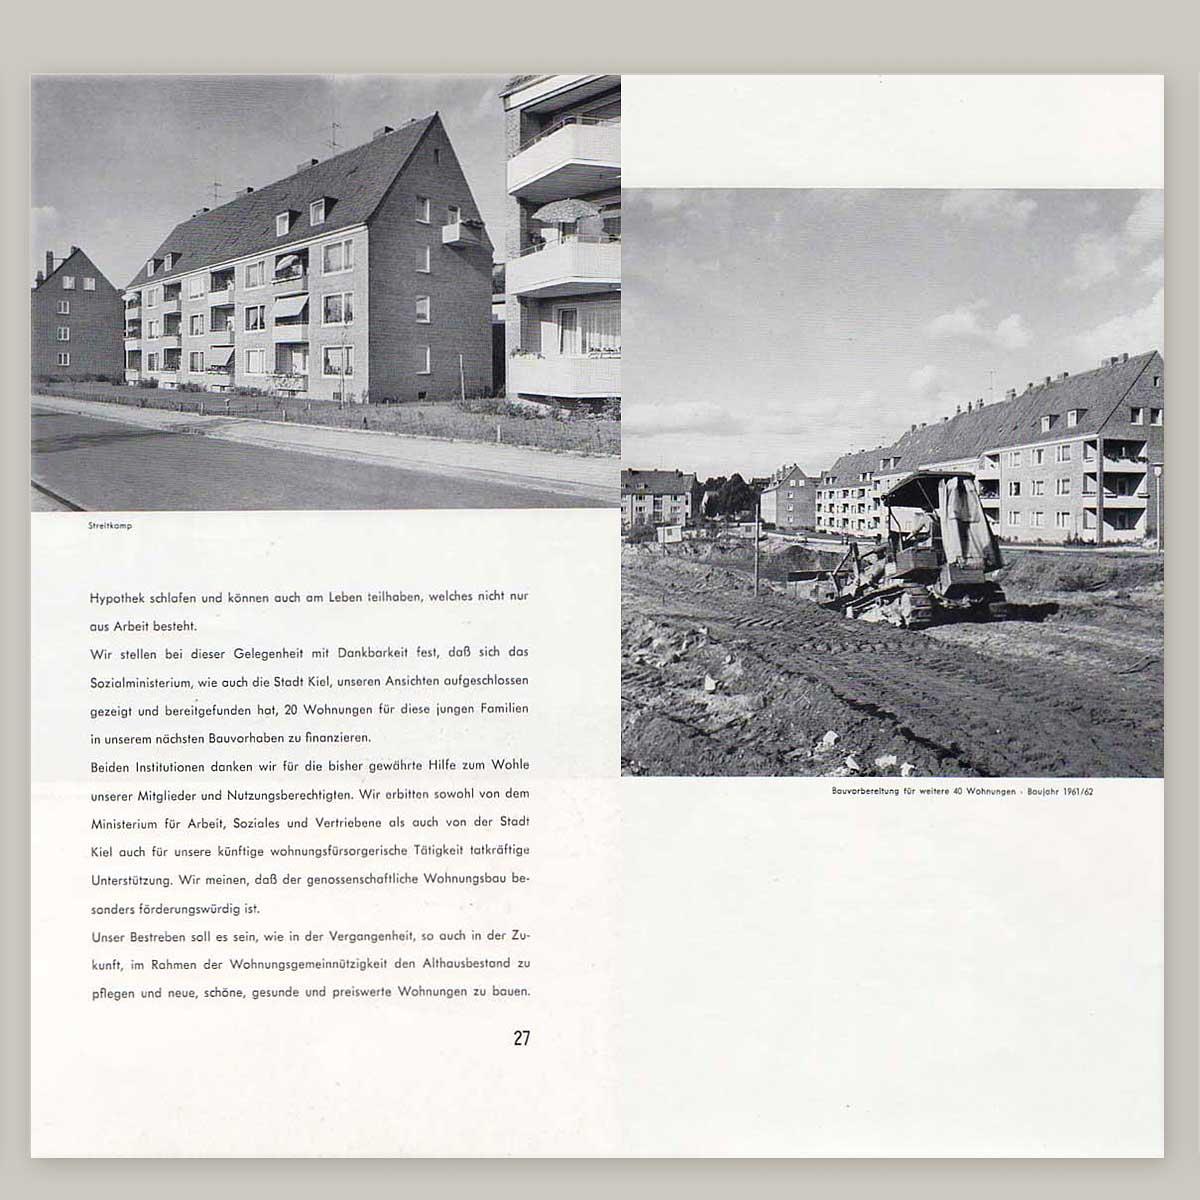 25 Jahre Baugenossenschaft Kiel Hassee